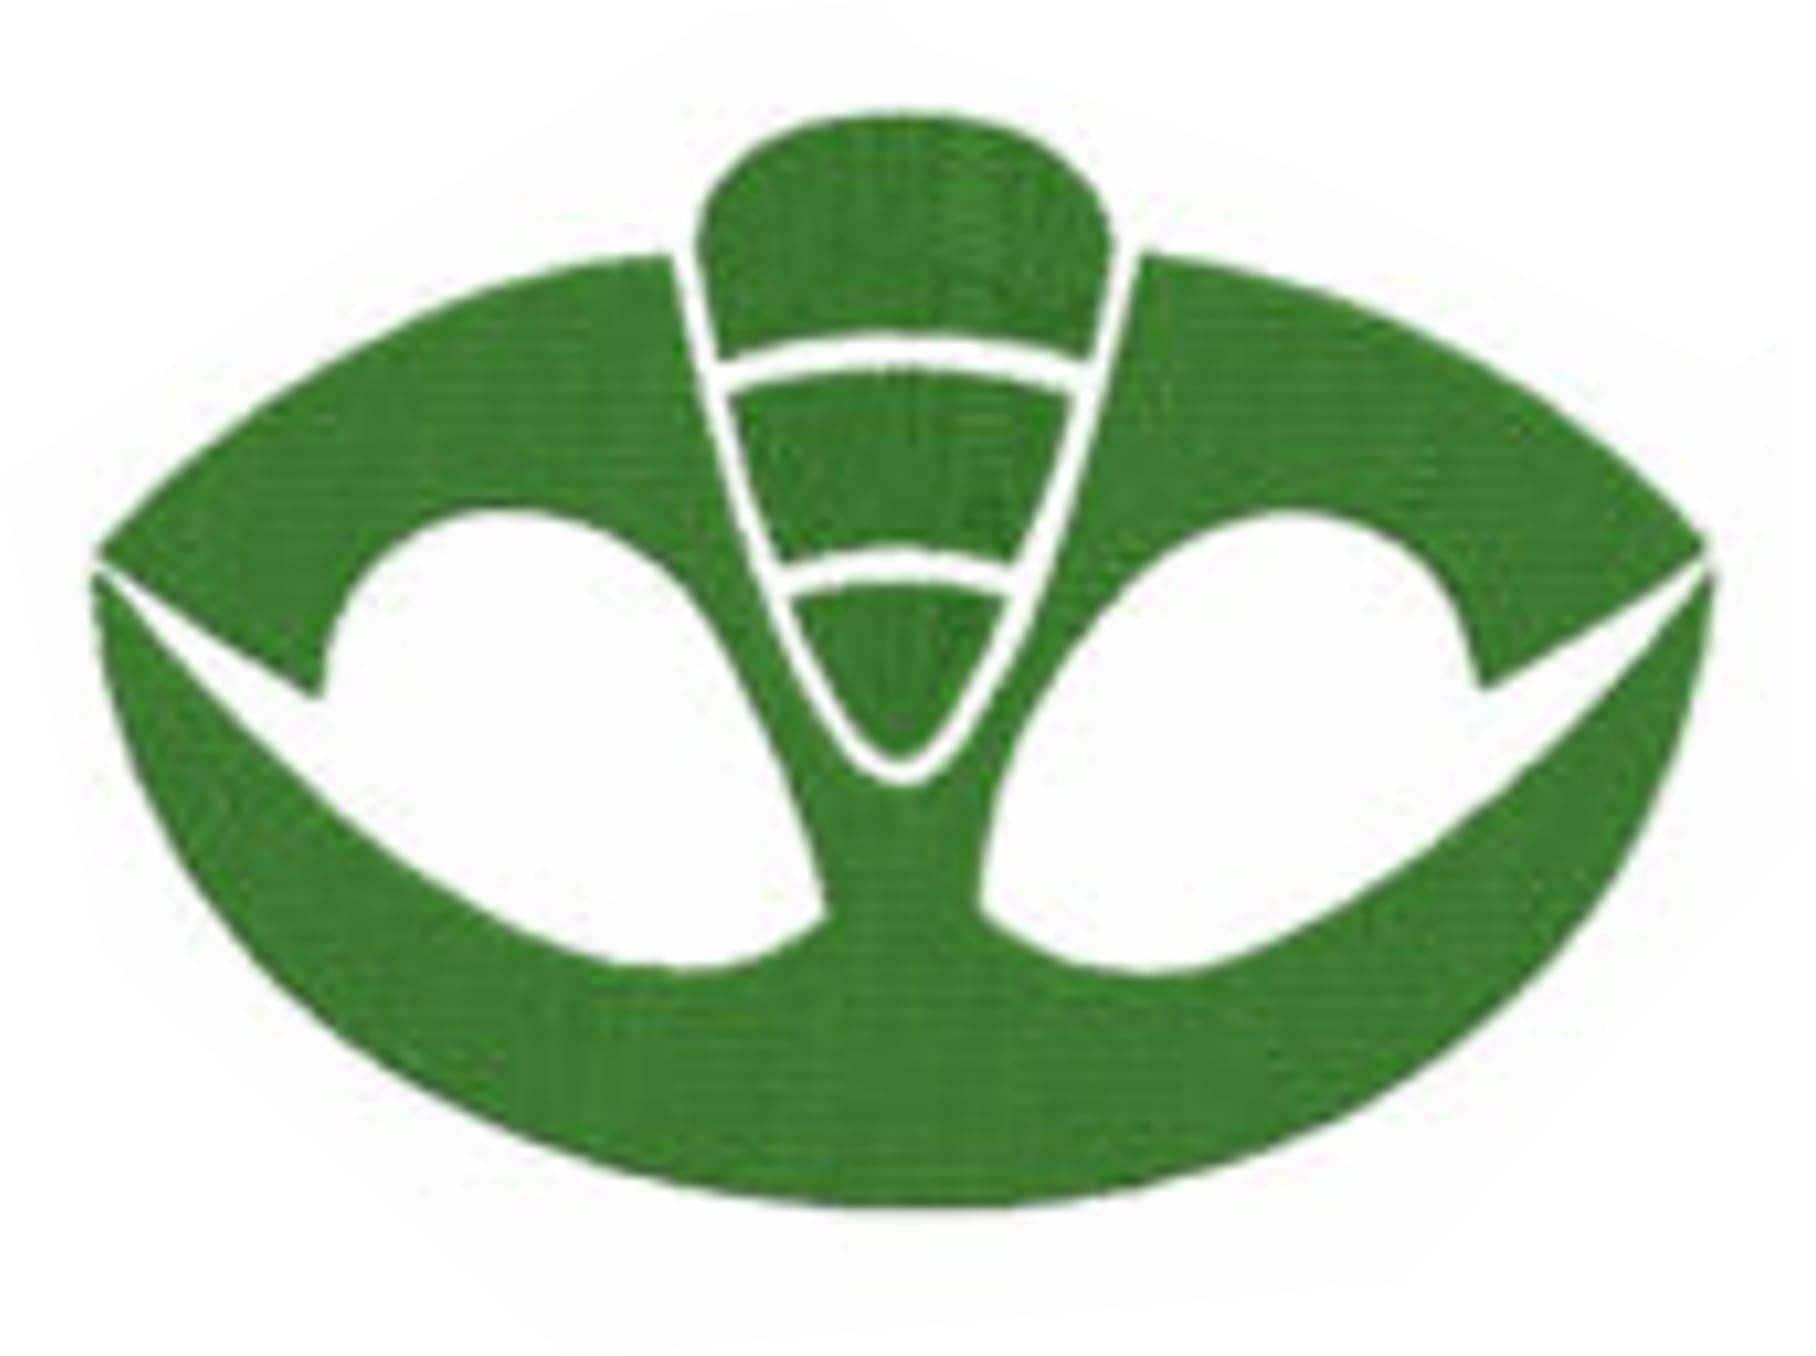 Gekko Pj Masks Symbol Cookie Cutter from KrysKut on Etsy ...